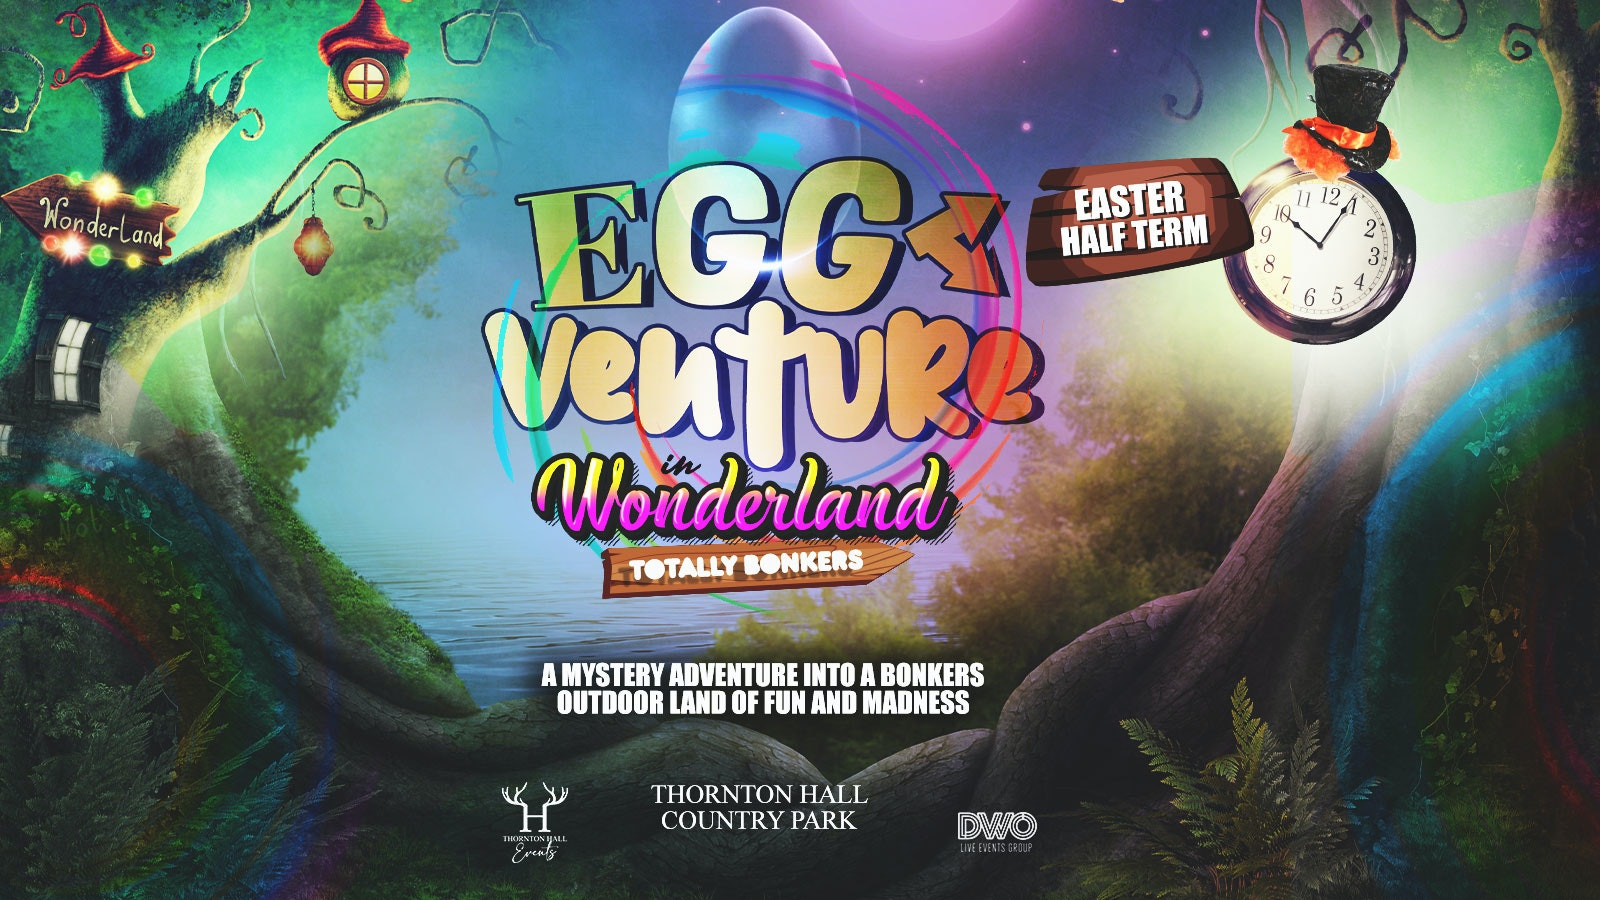 EggVenture in Wonderland – Tuesday 30th March – 12.30pm